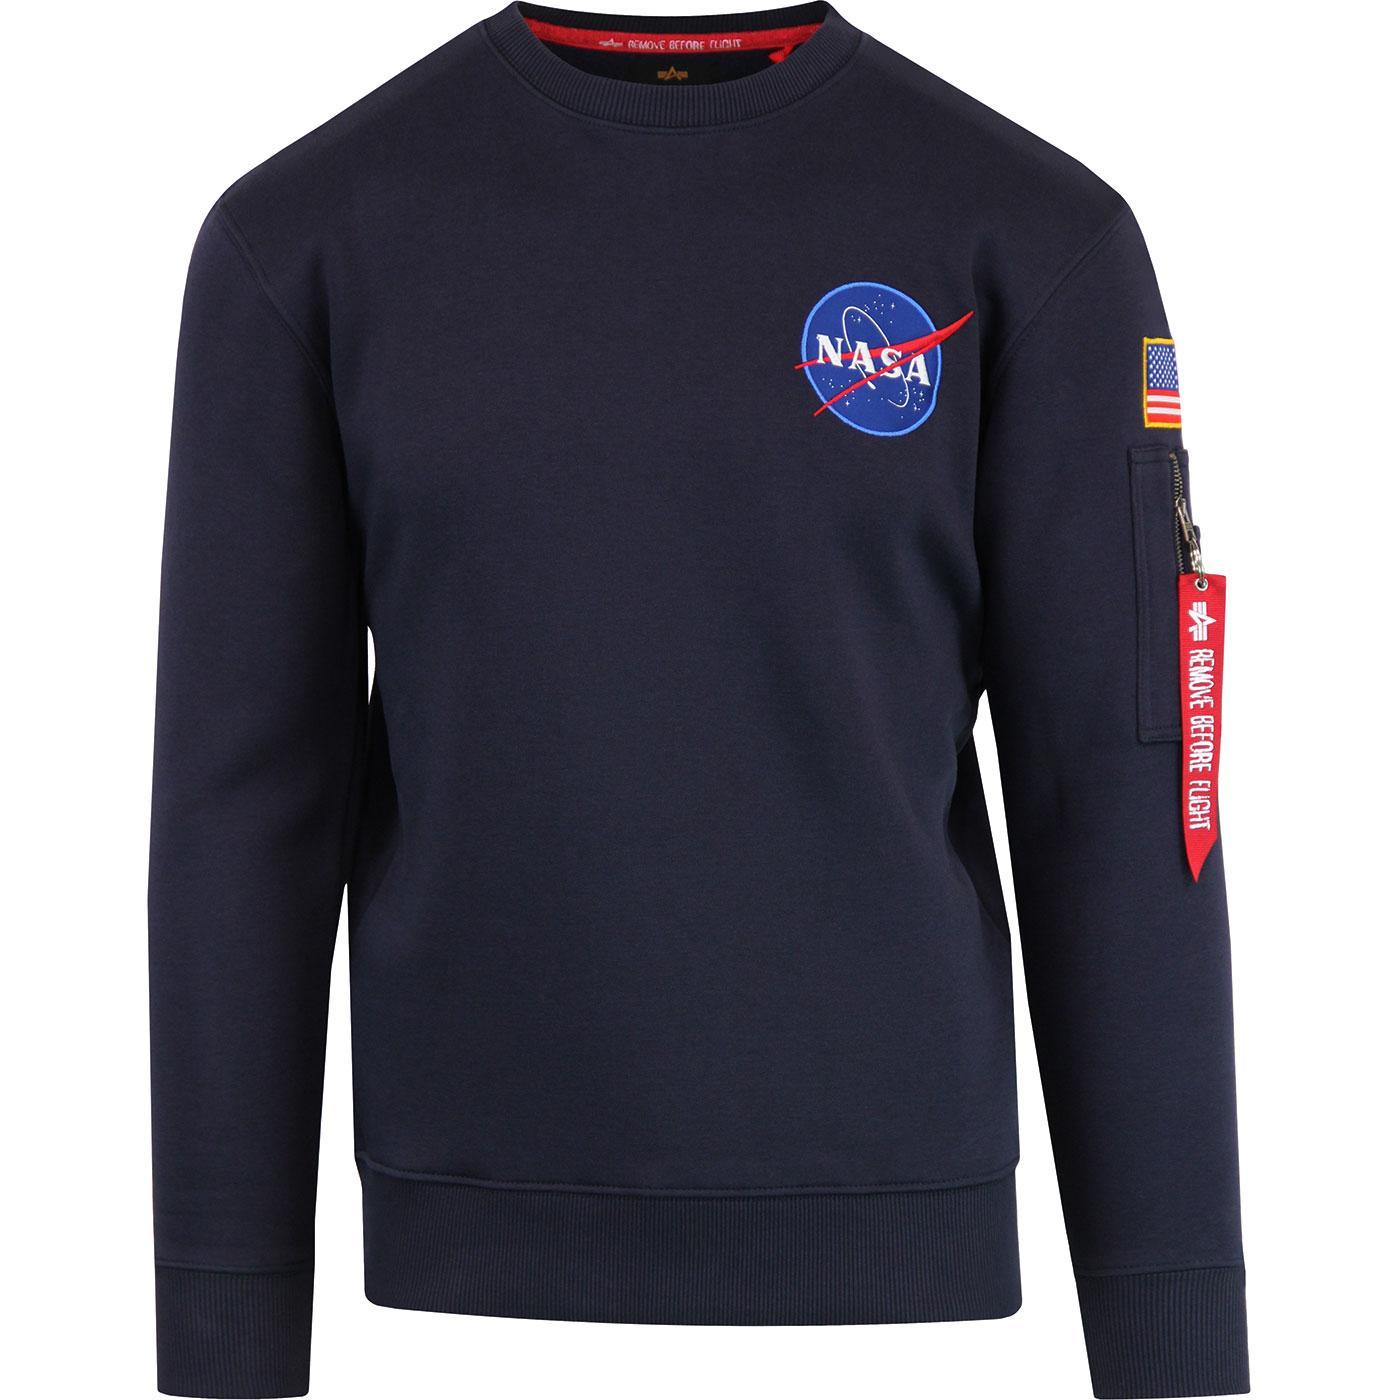 ALPHA INDUSTRIES Retro NASA Space Shuttle Sweater